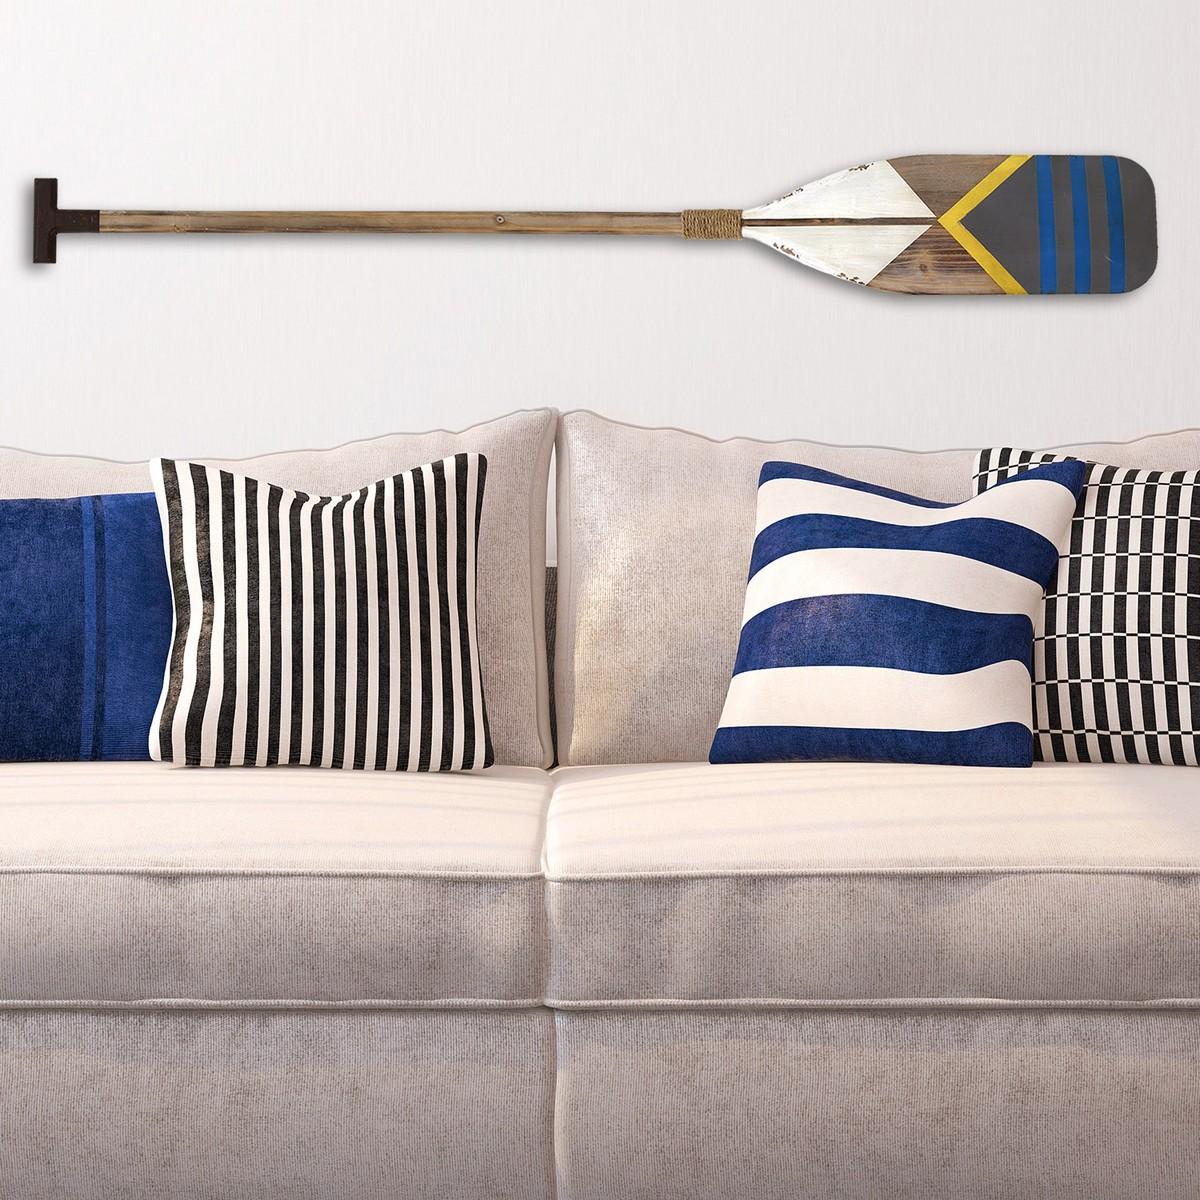 Stratton Home Decor Nautical Oar Wall Decor - Natural Wood/White/Yellow/Blue/Grey